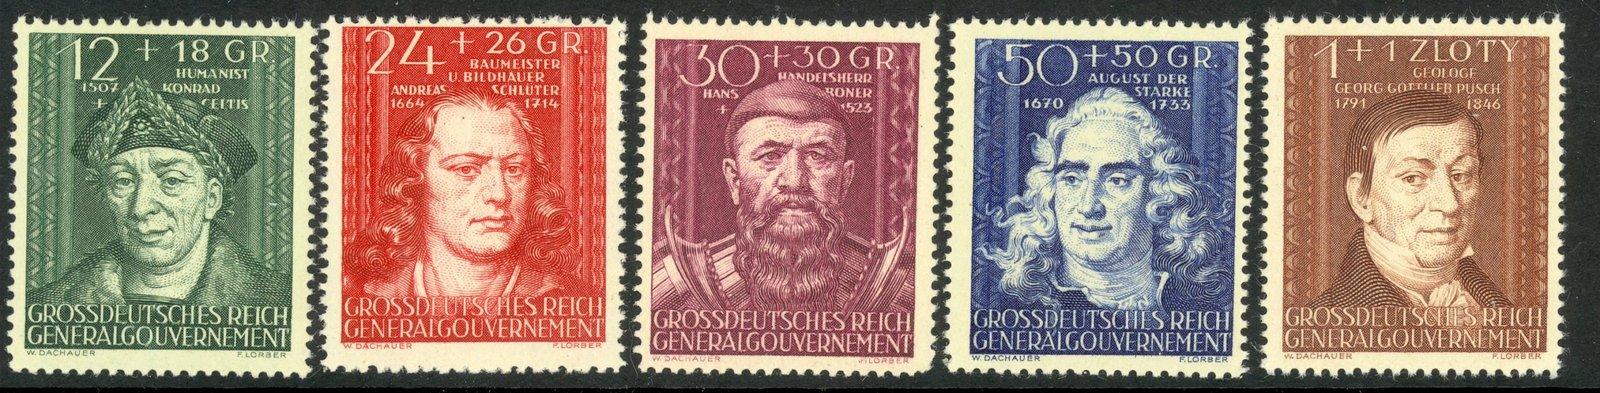 Polandnb36 40